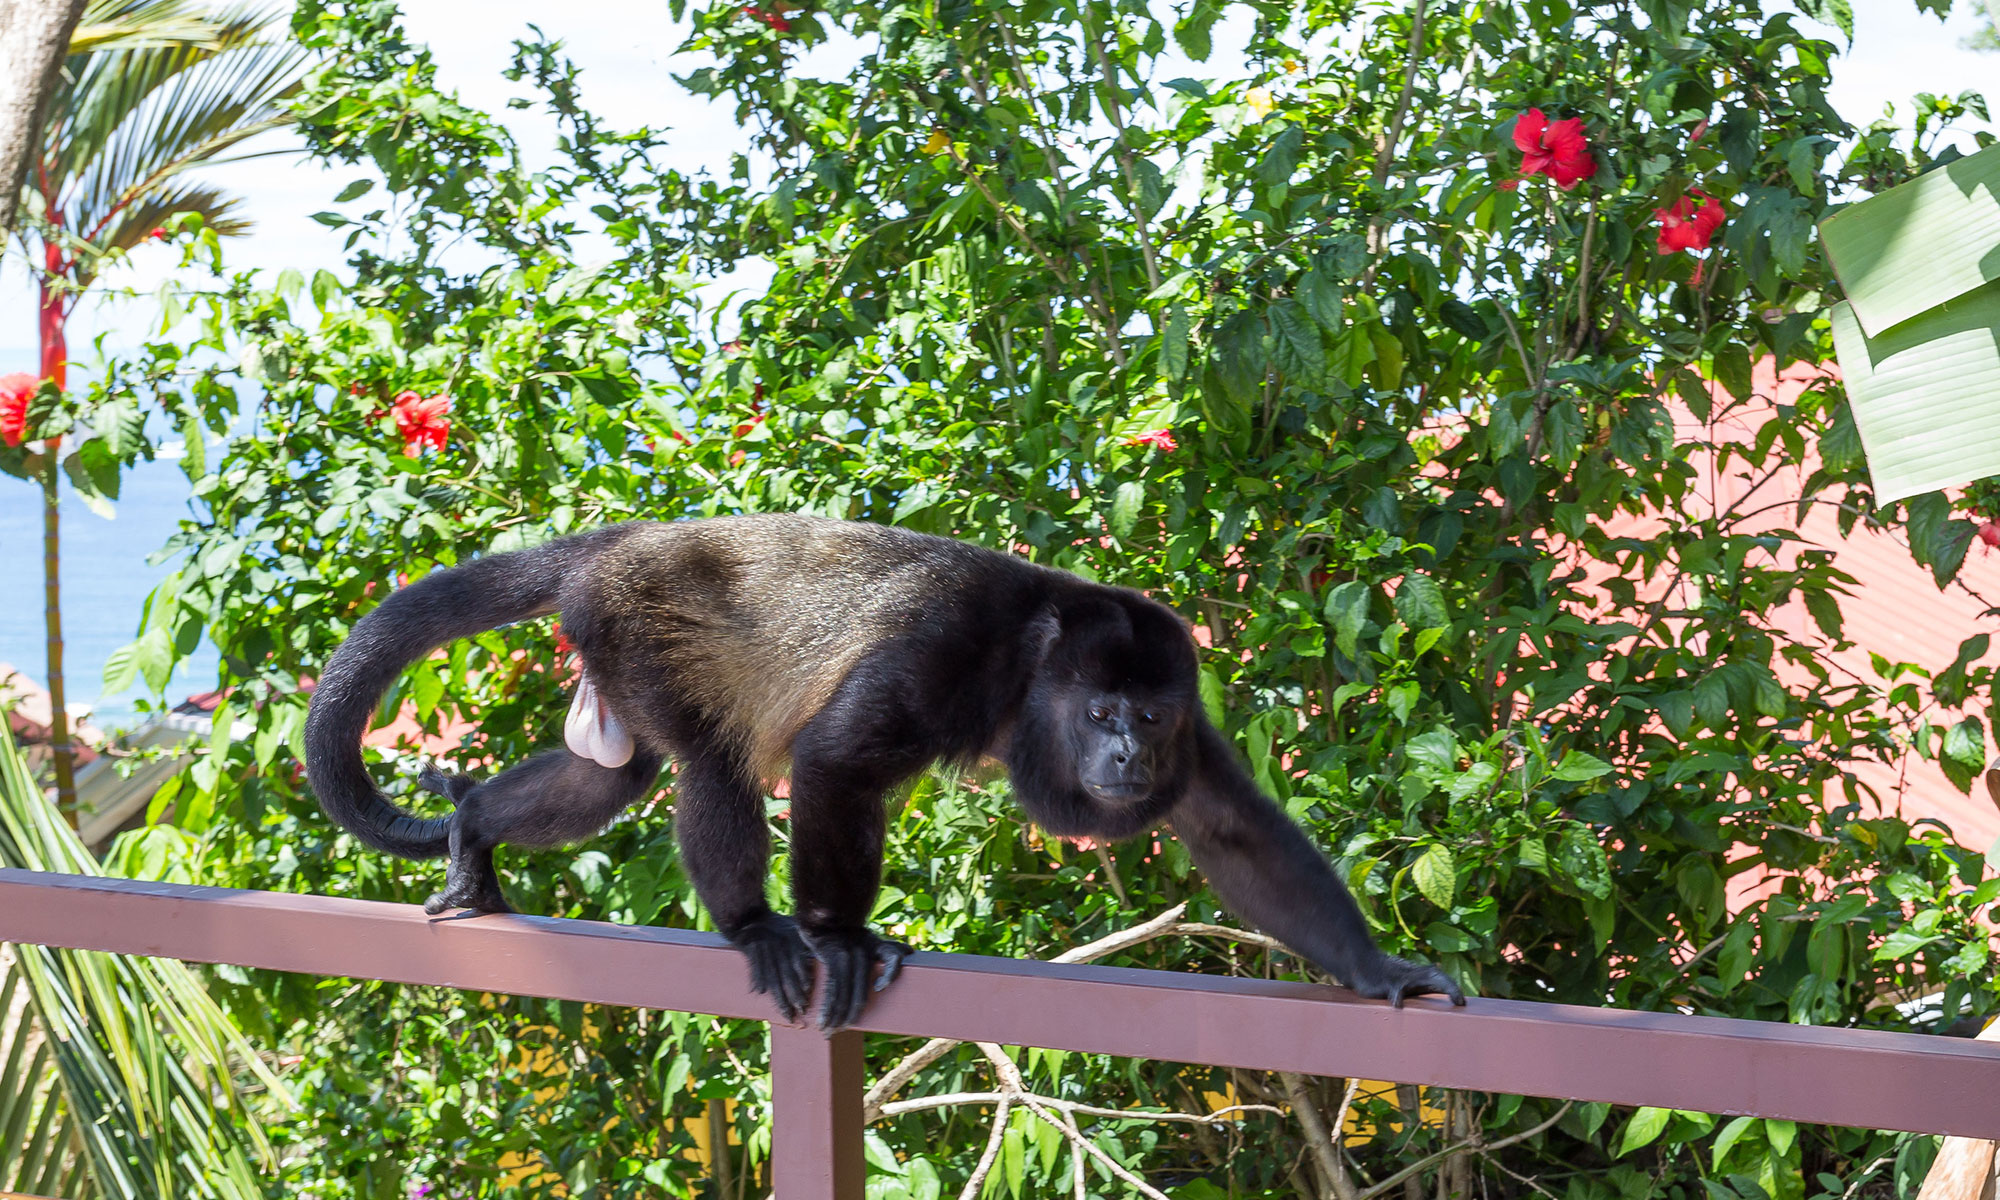 Villa Natura howler monkey visitor